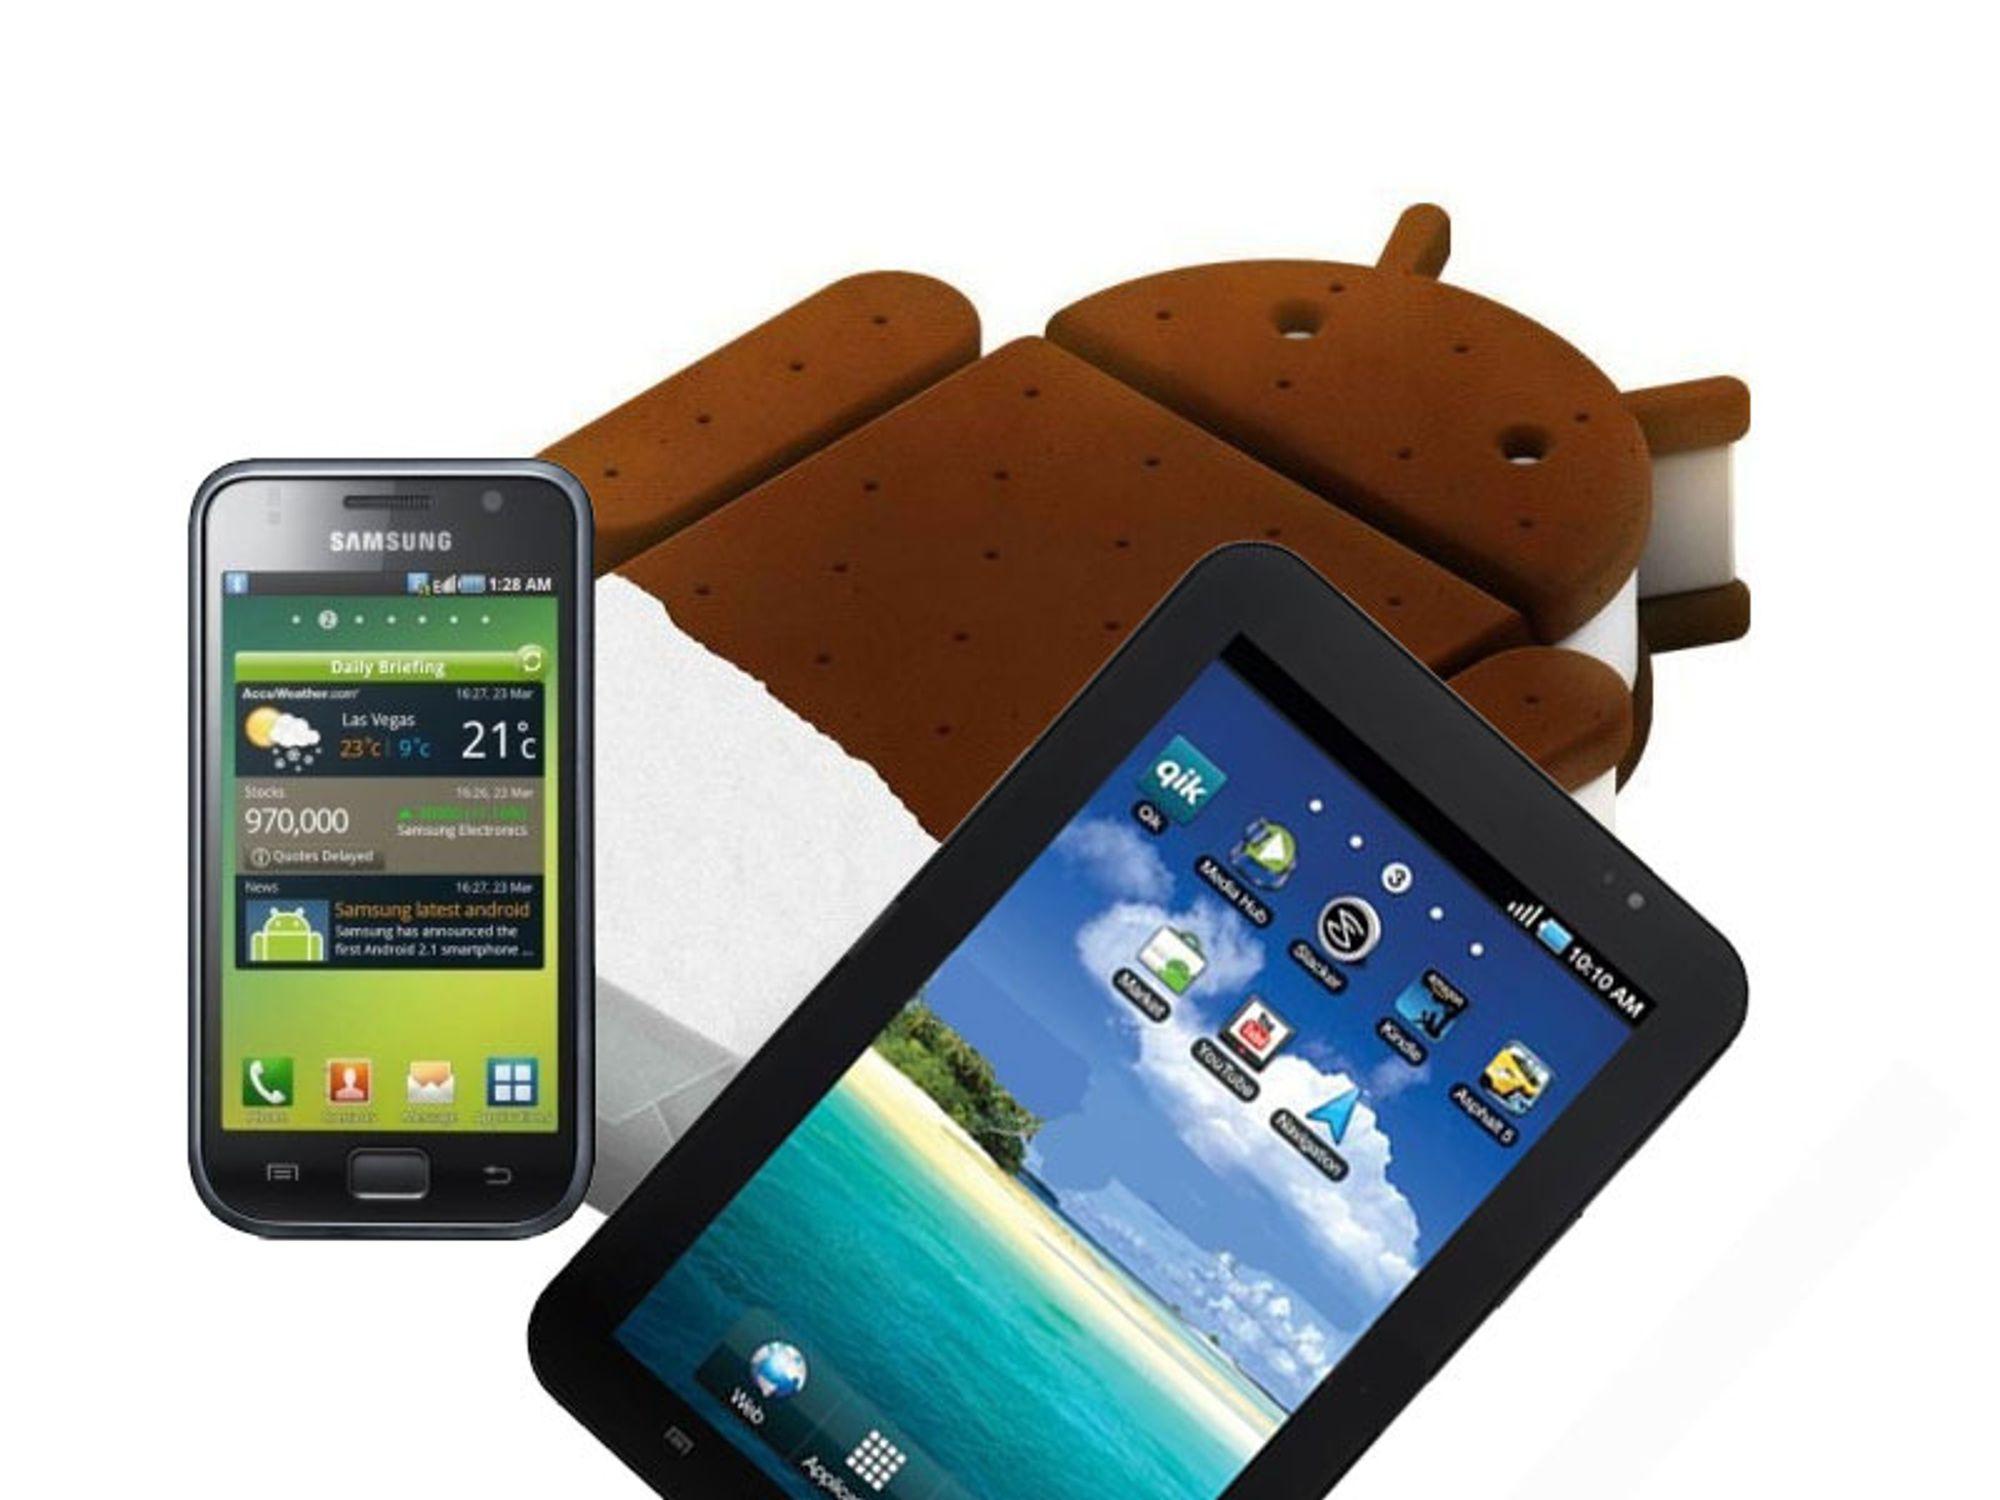 Samsung revurderer Android 4.0 til Galaxy S